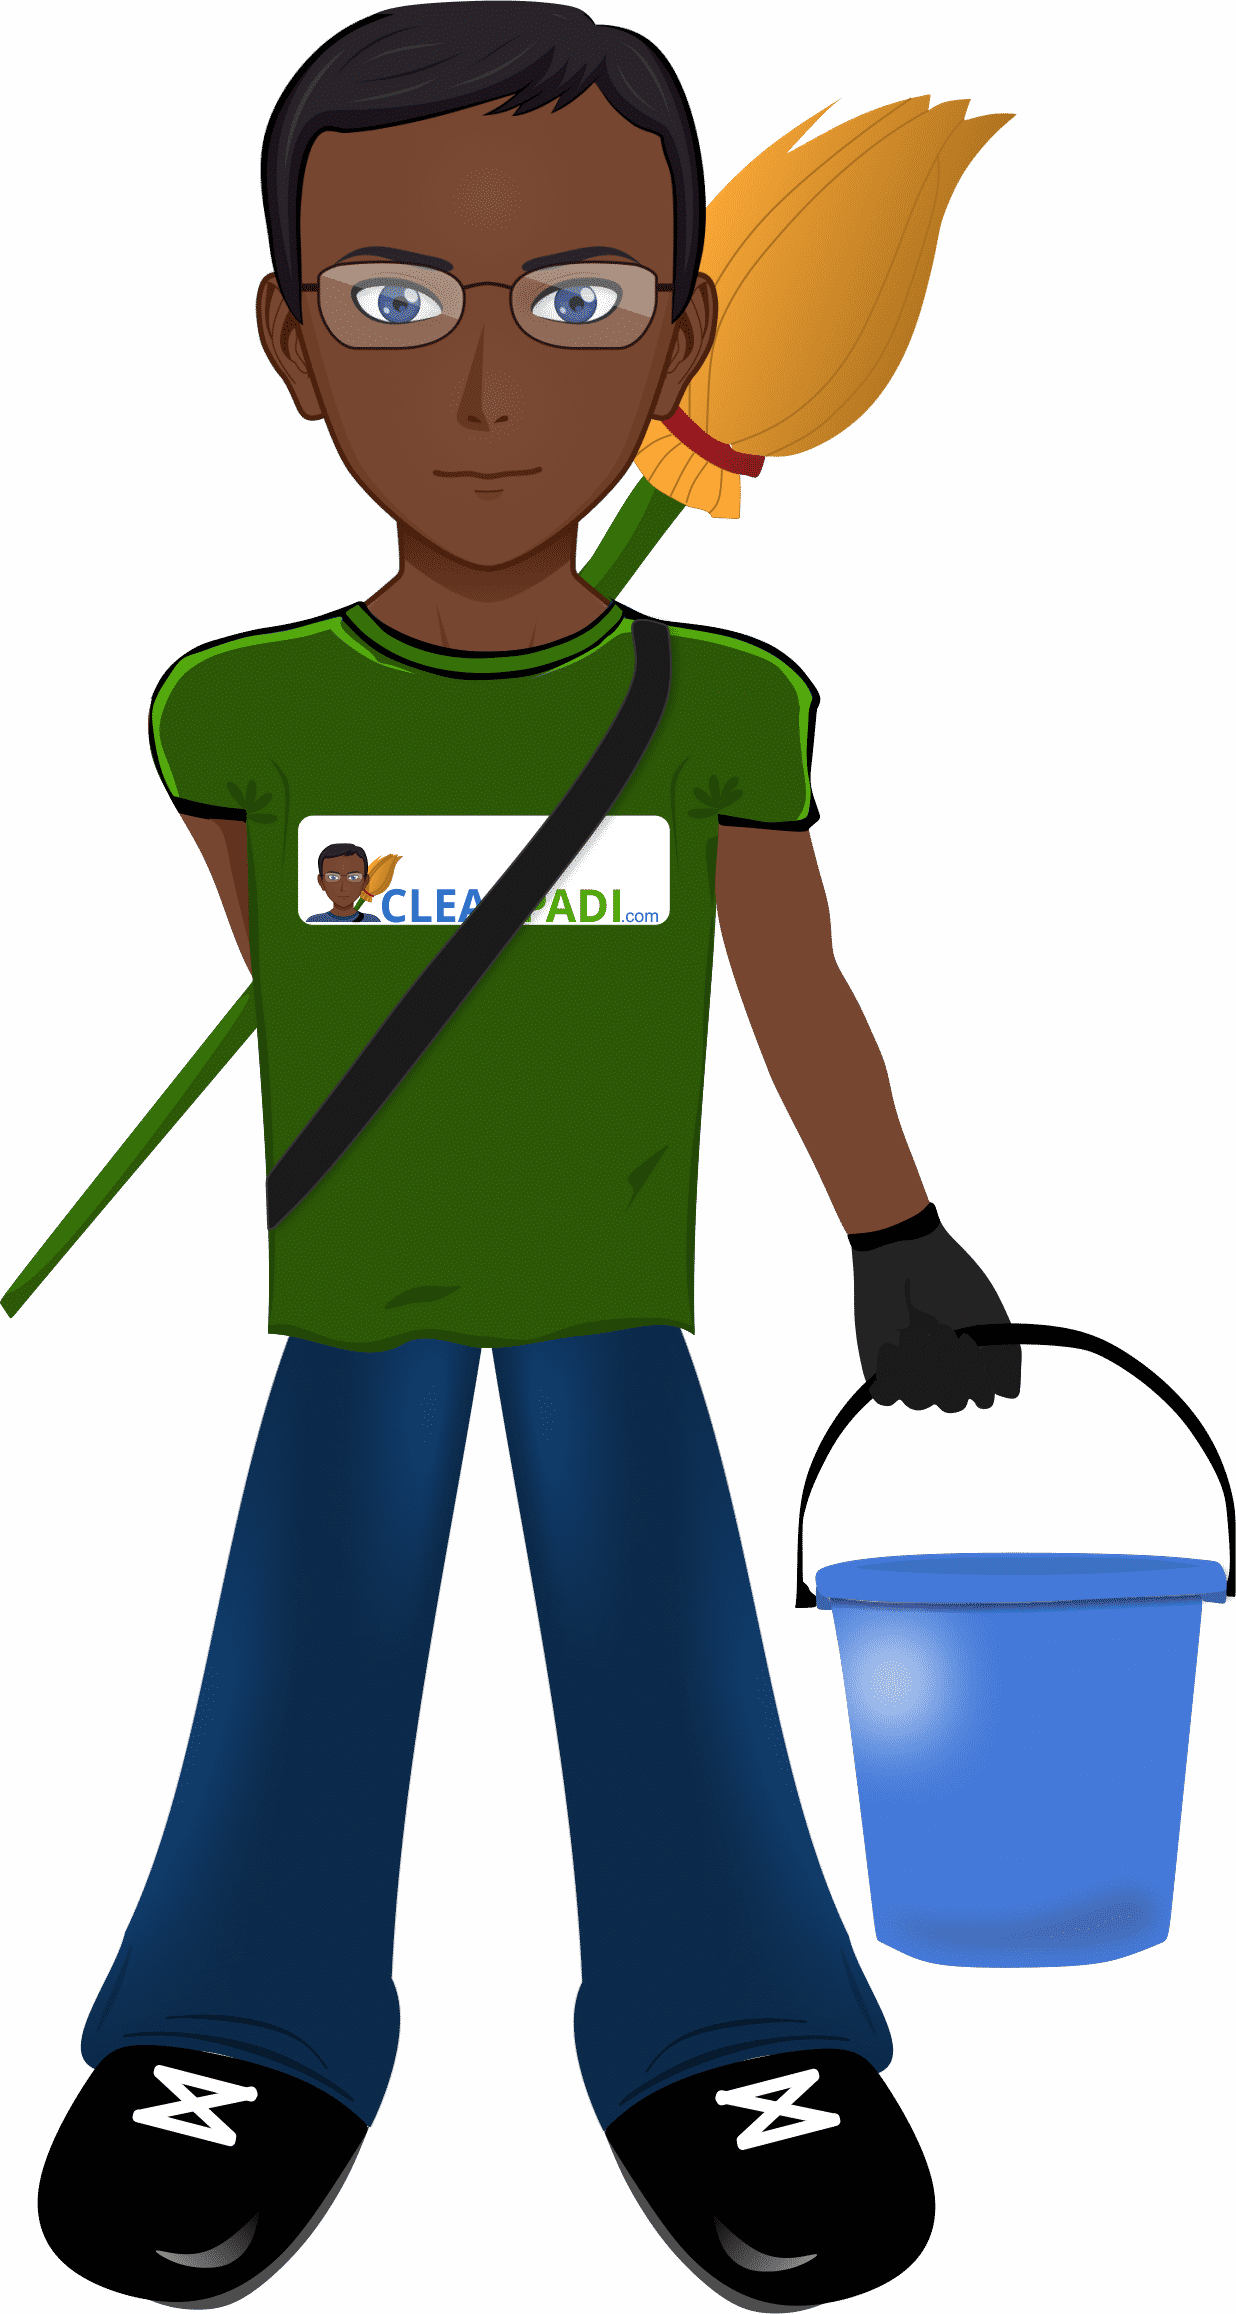 Car wash bucket clipart clip art library library We are CleanPadi – CLEANPADI clip art library library